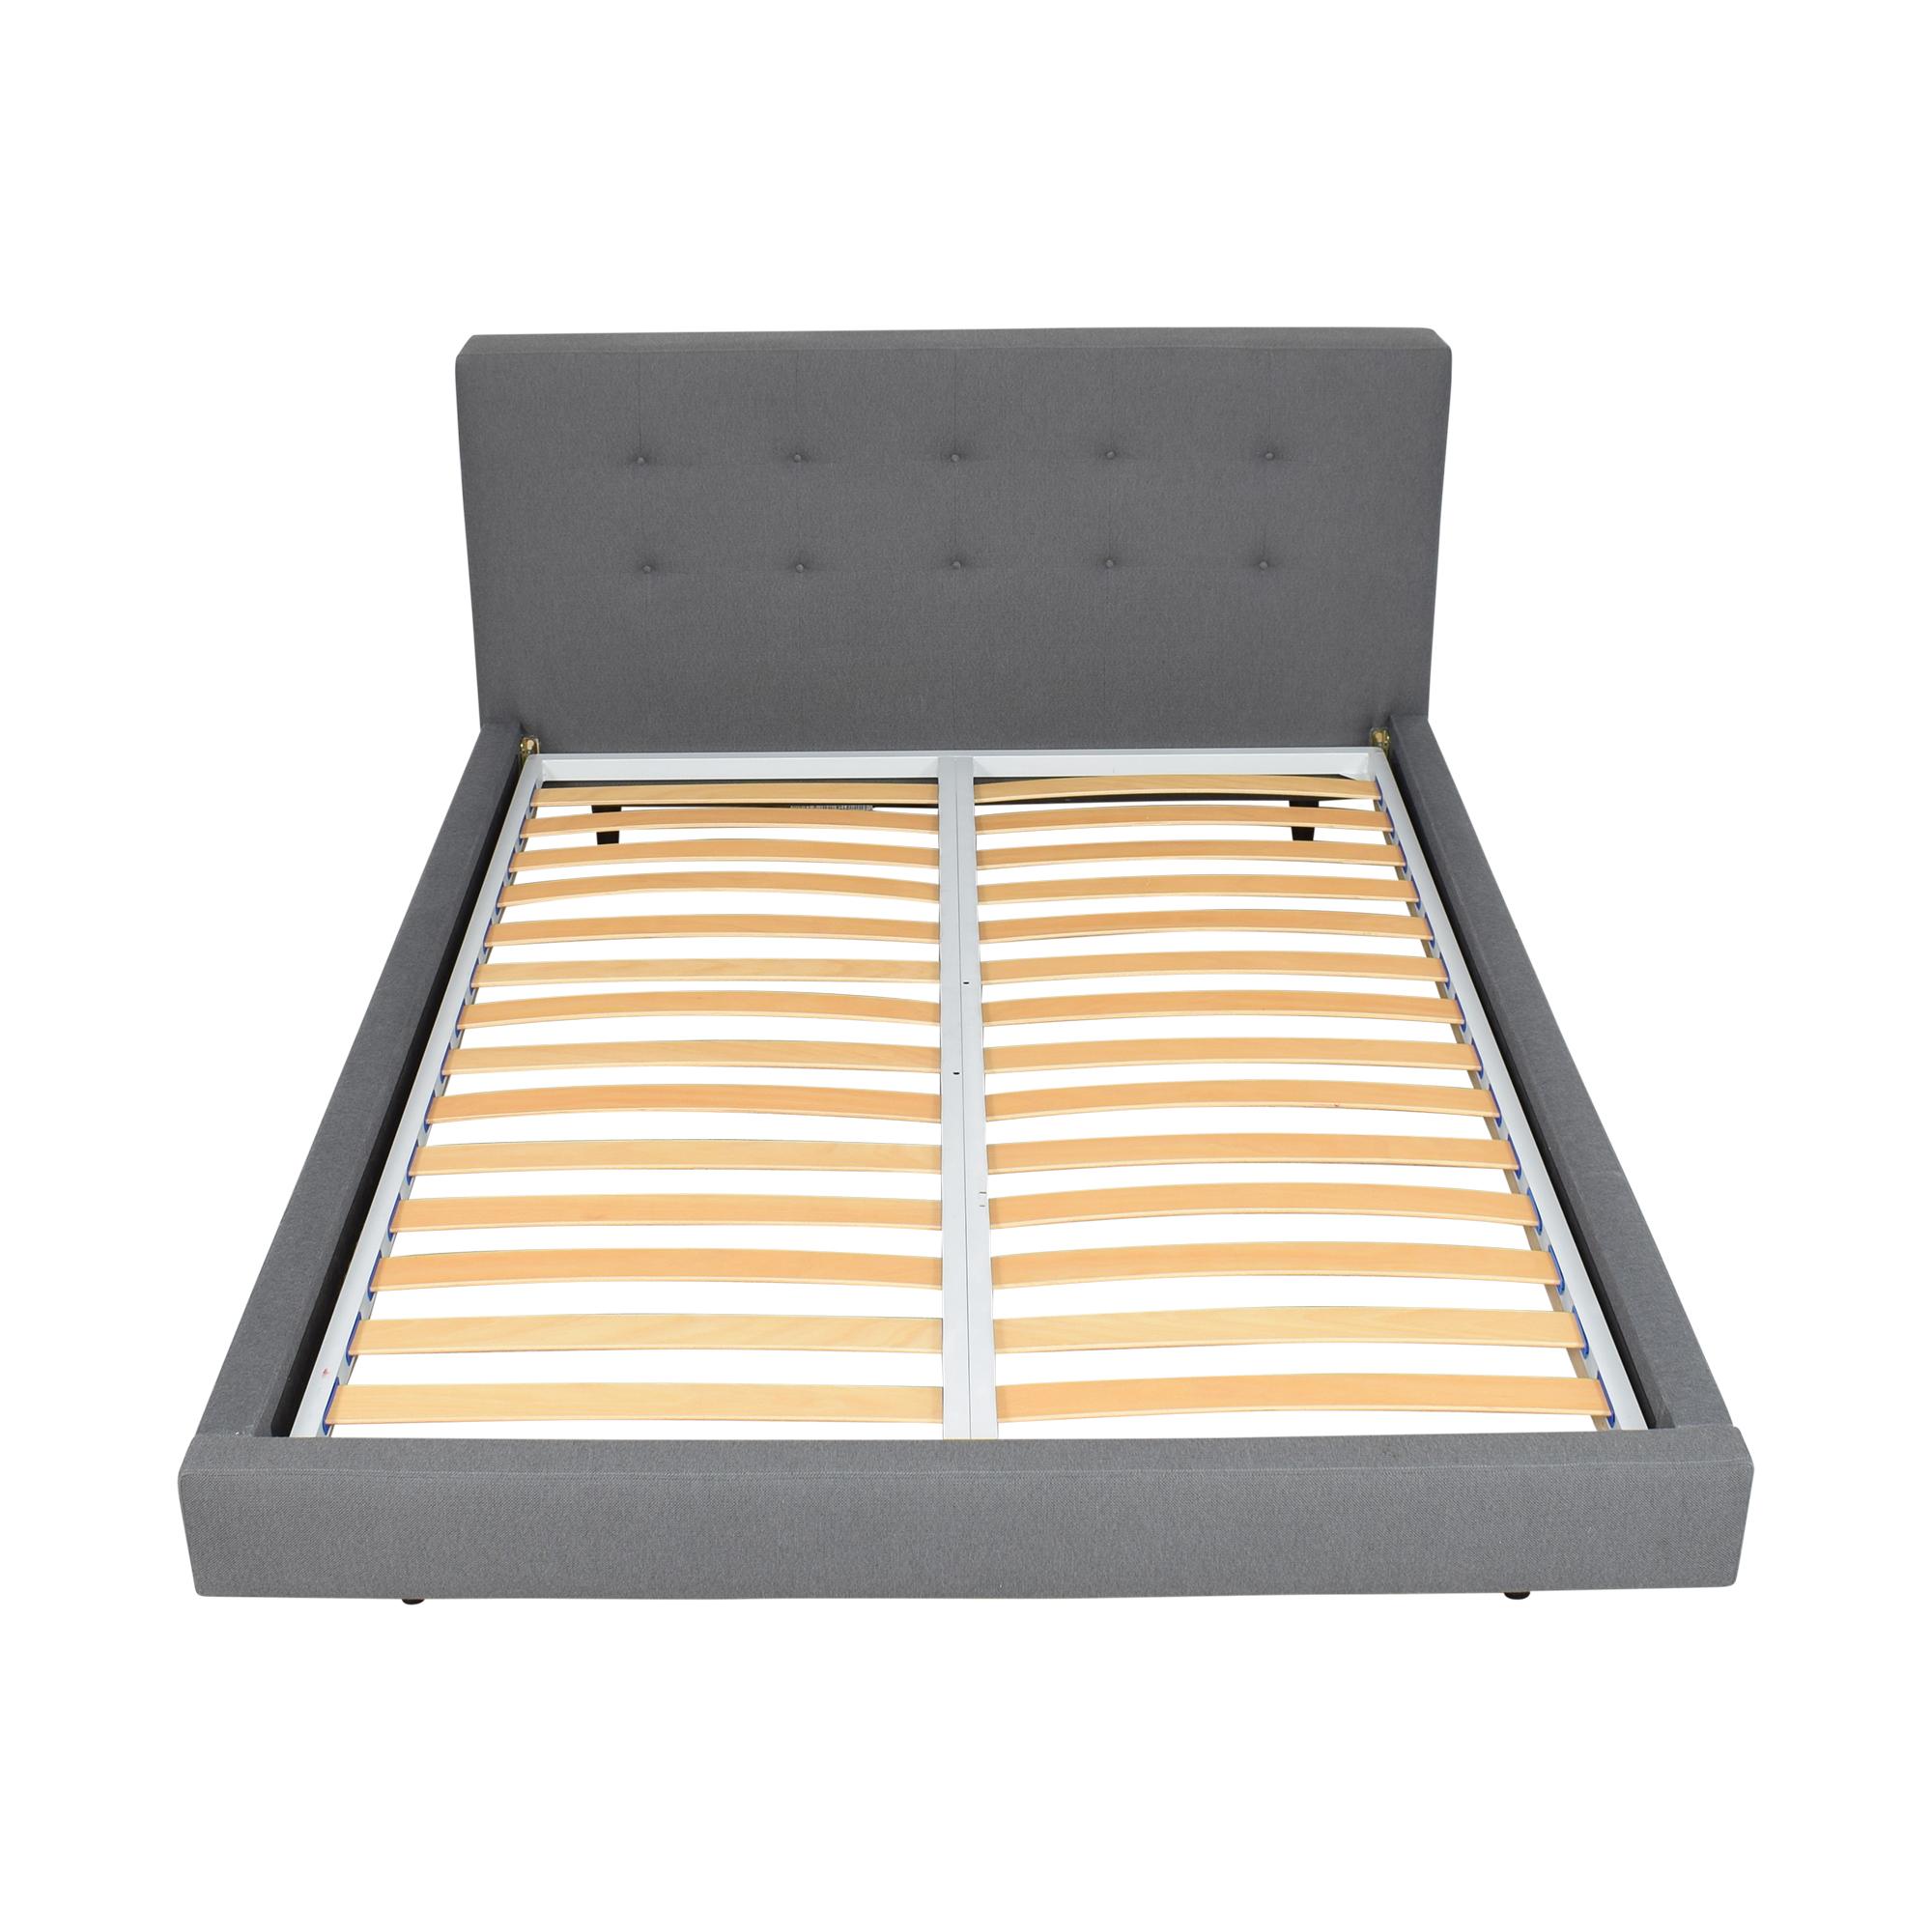 shop Crate & Barrel Crate & Barrel Tate Upholstered Queen Bed online